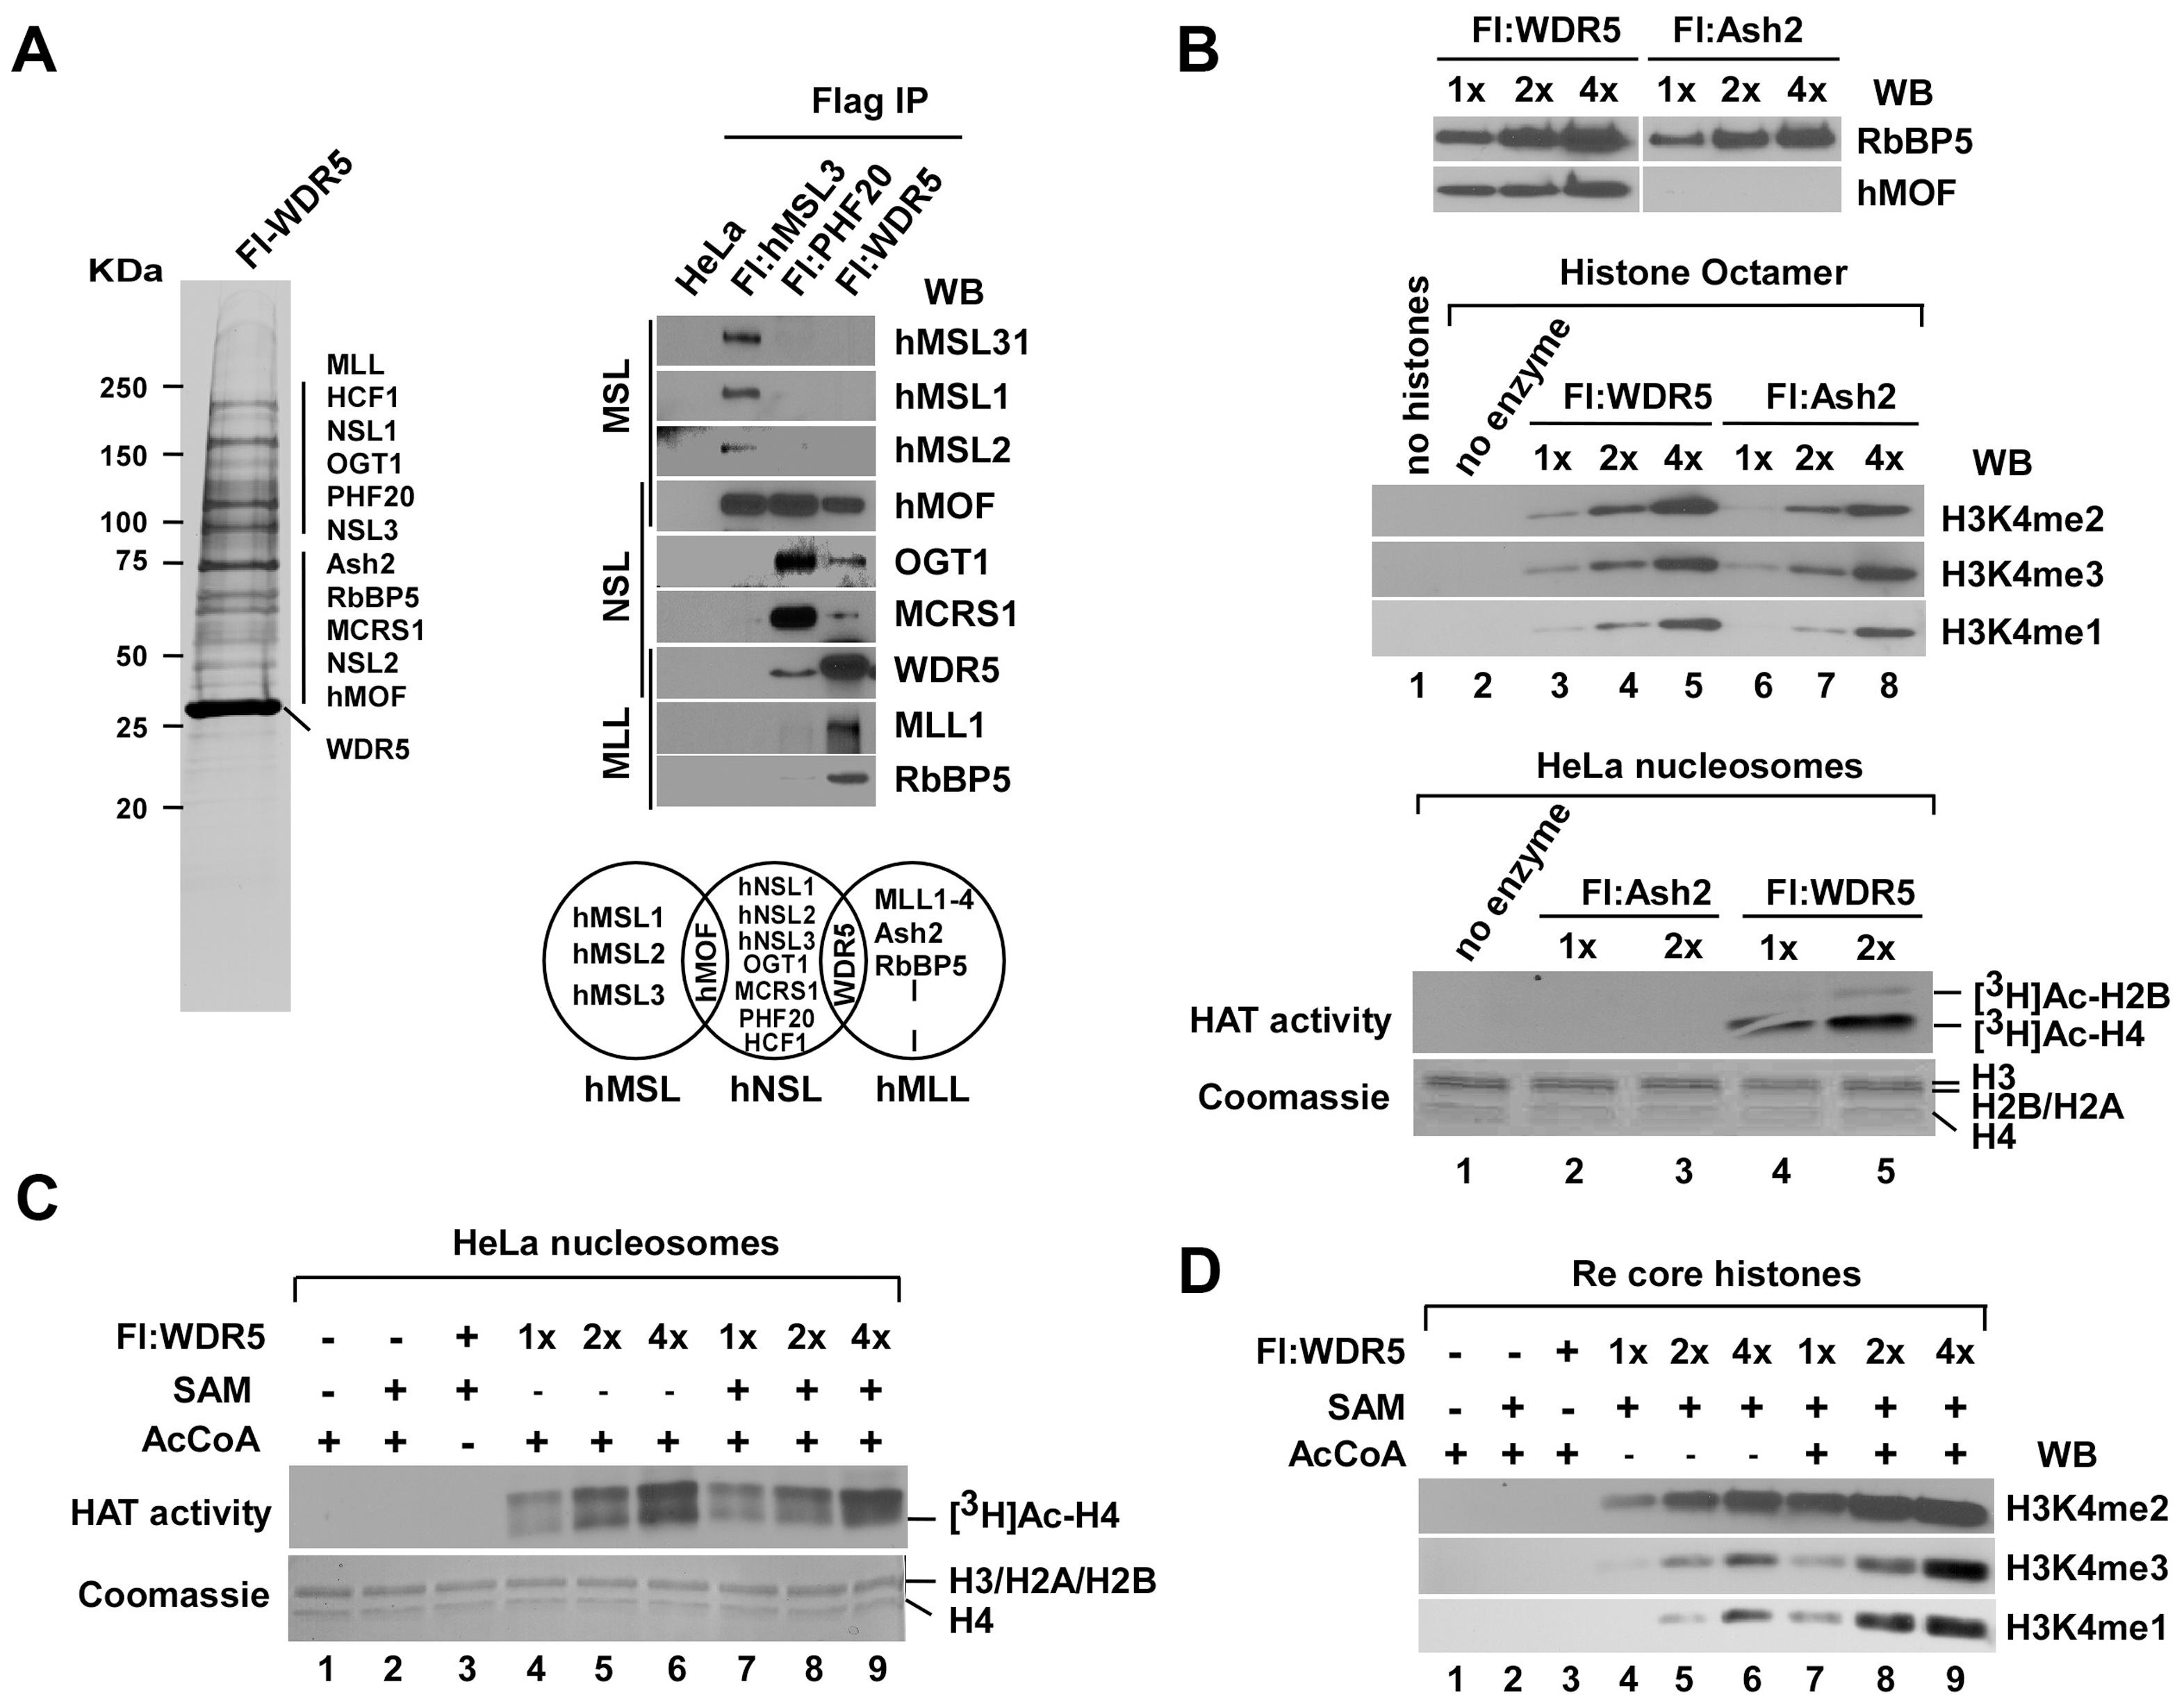 HAT activity facilitates histone H3K4 methylation by WDR5-containing complex <i>in vitro</i>.